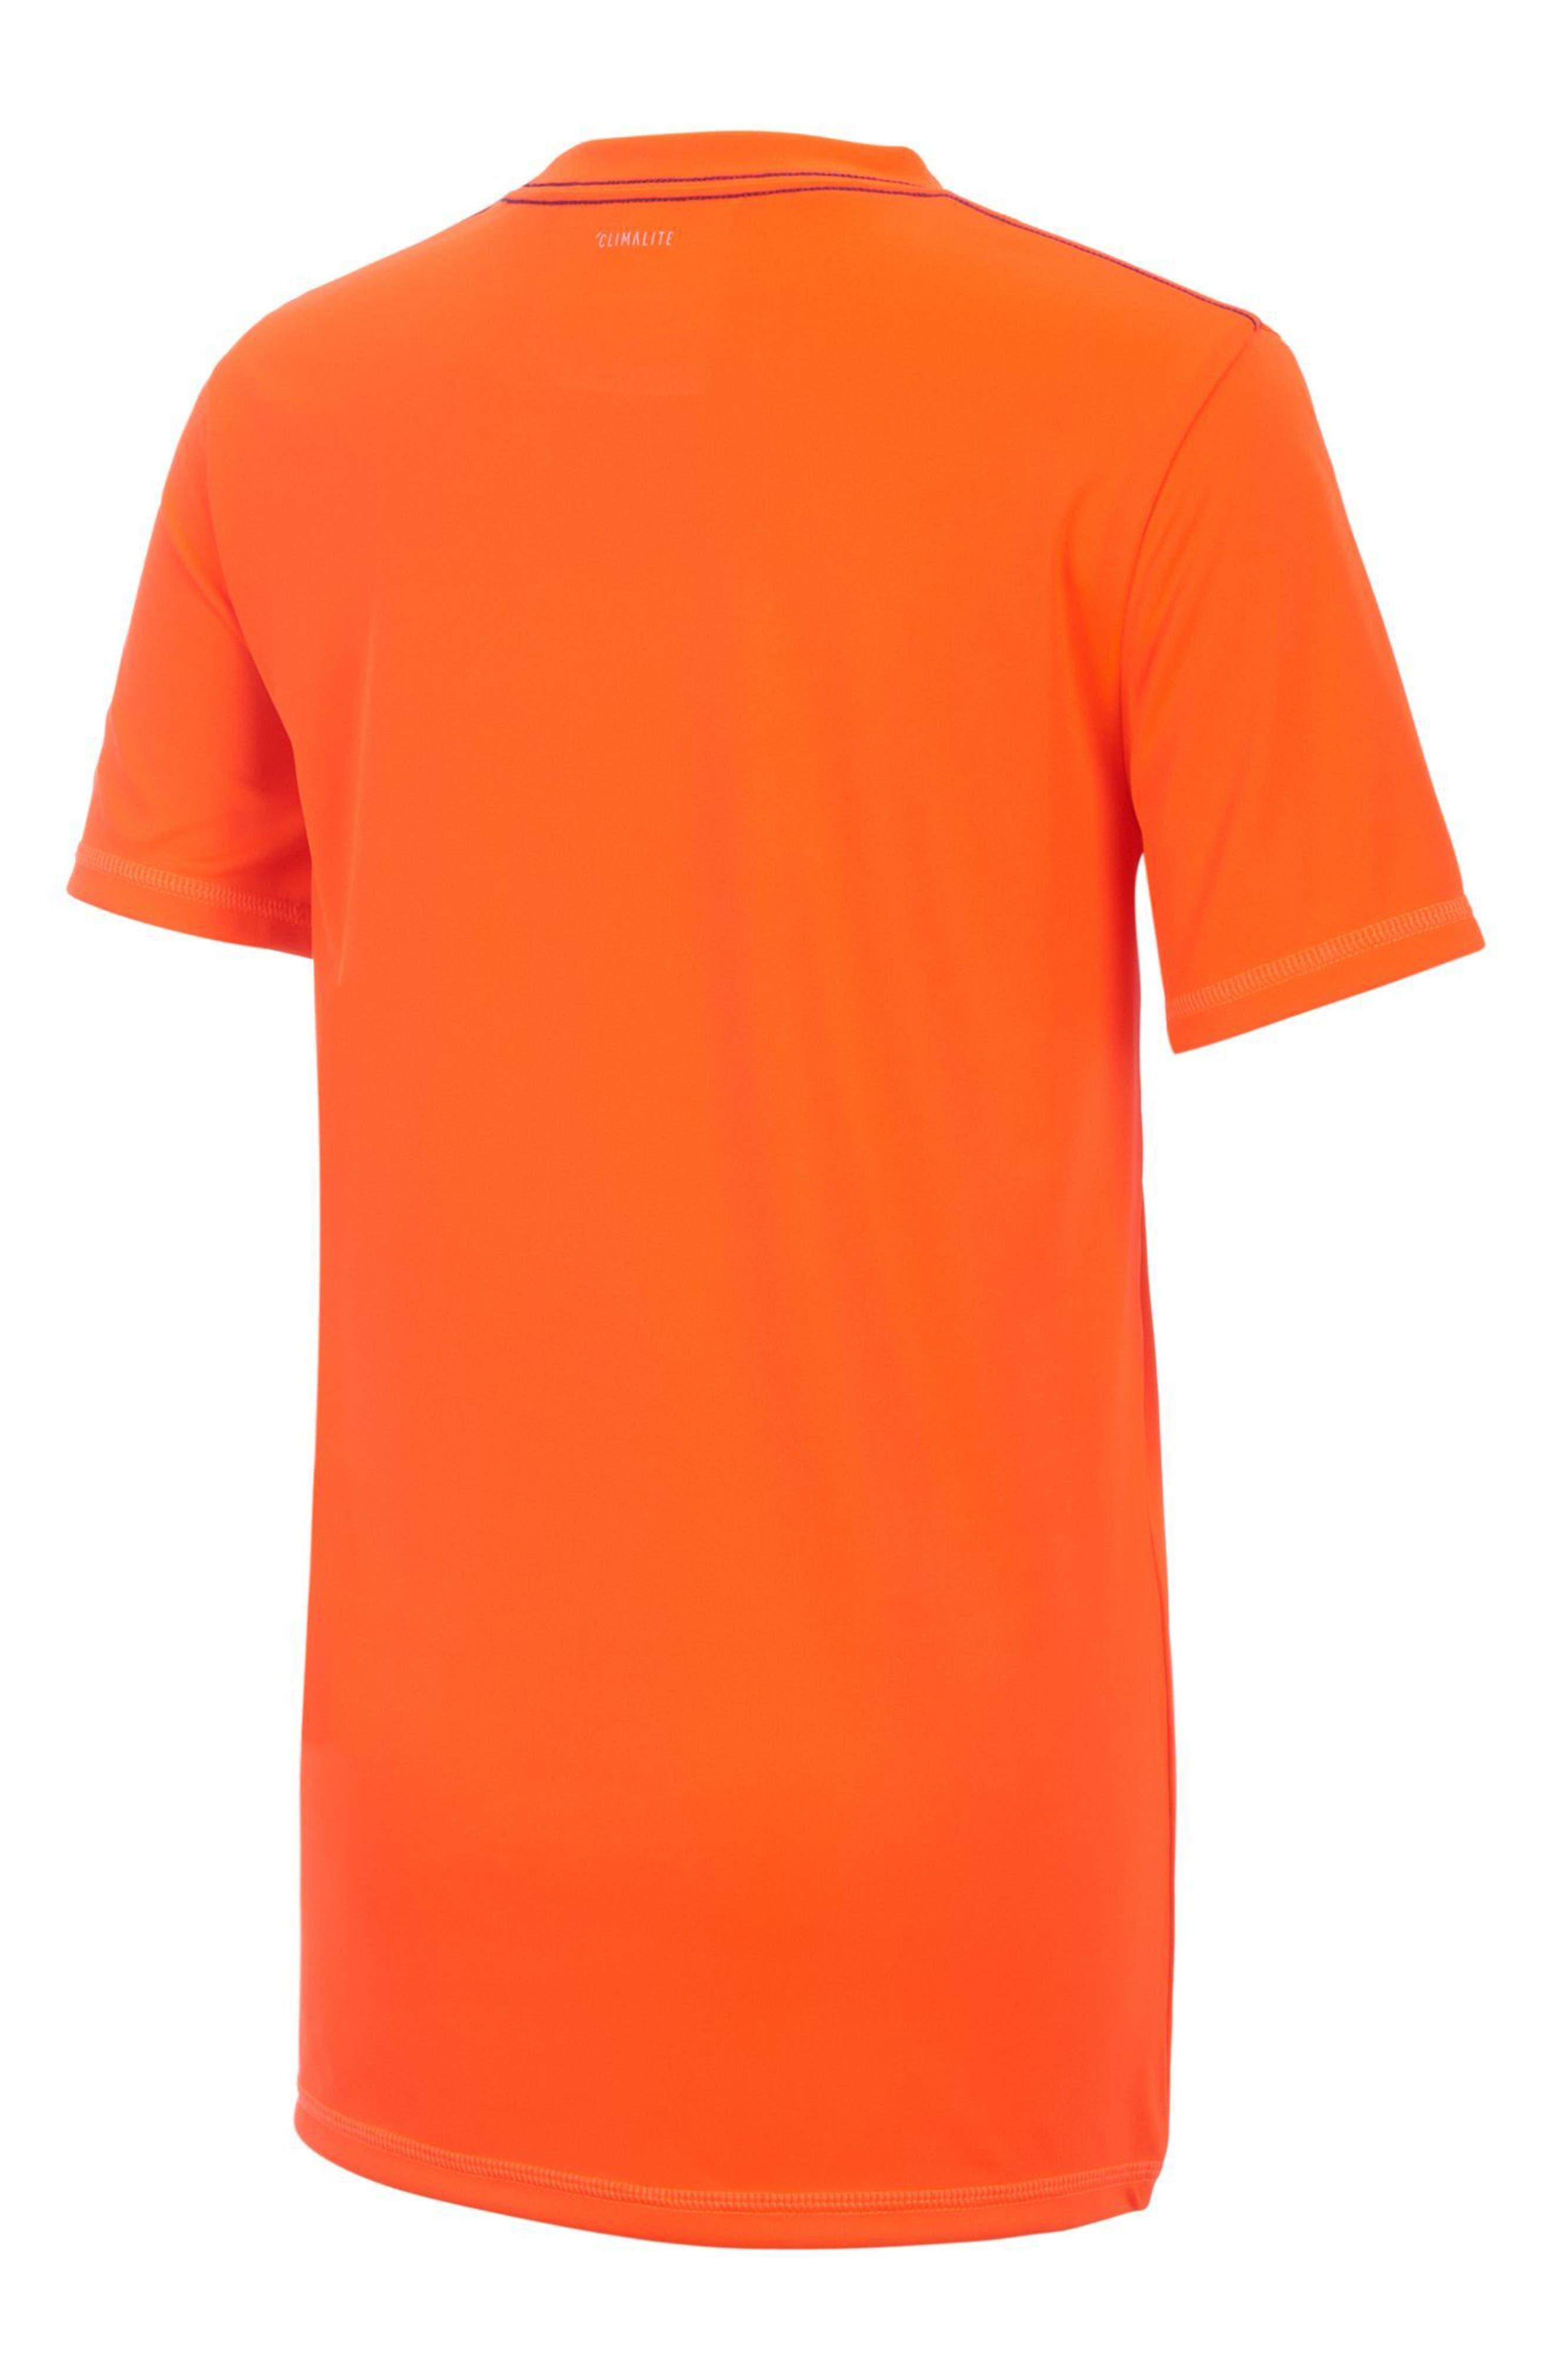 Logo T-Shirt,                             Alternate thumbnail 2, color,                             Red Orange